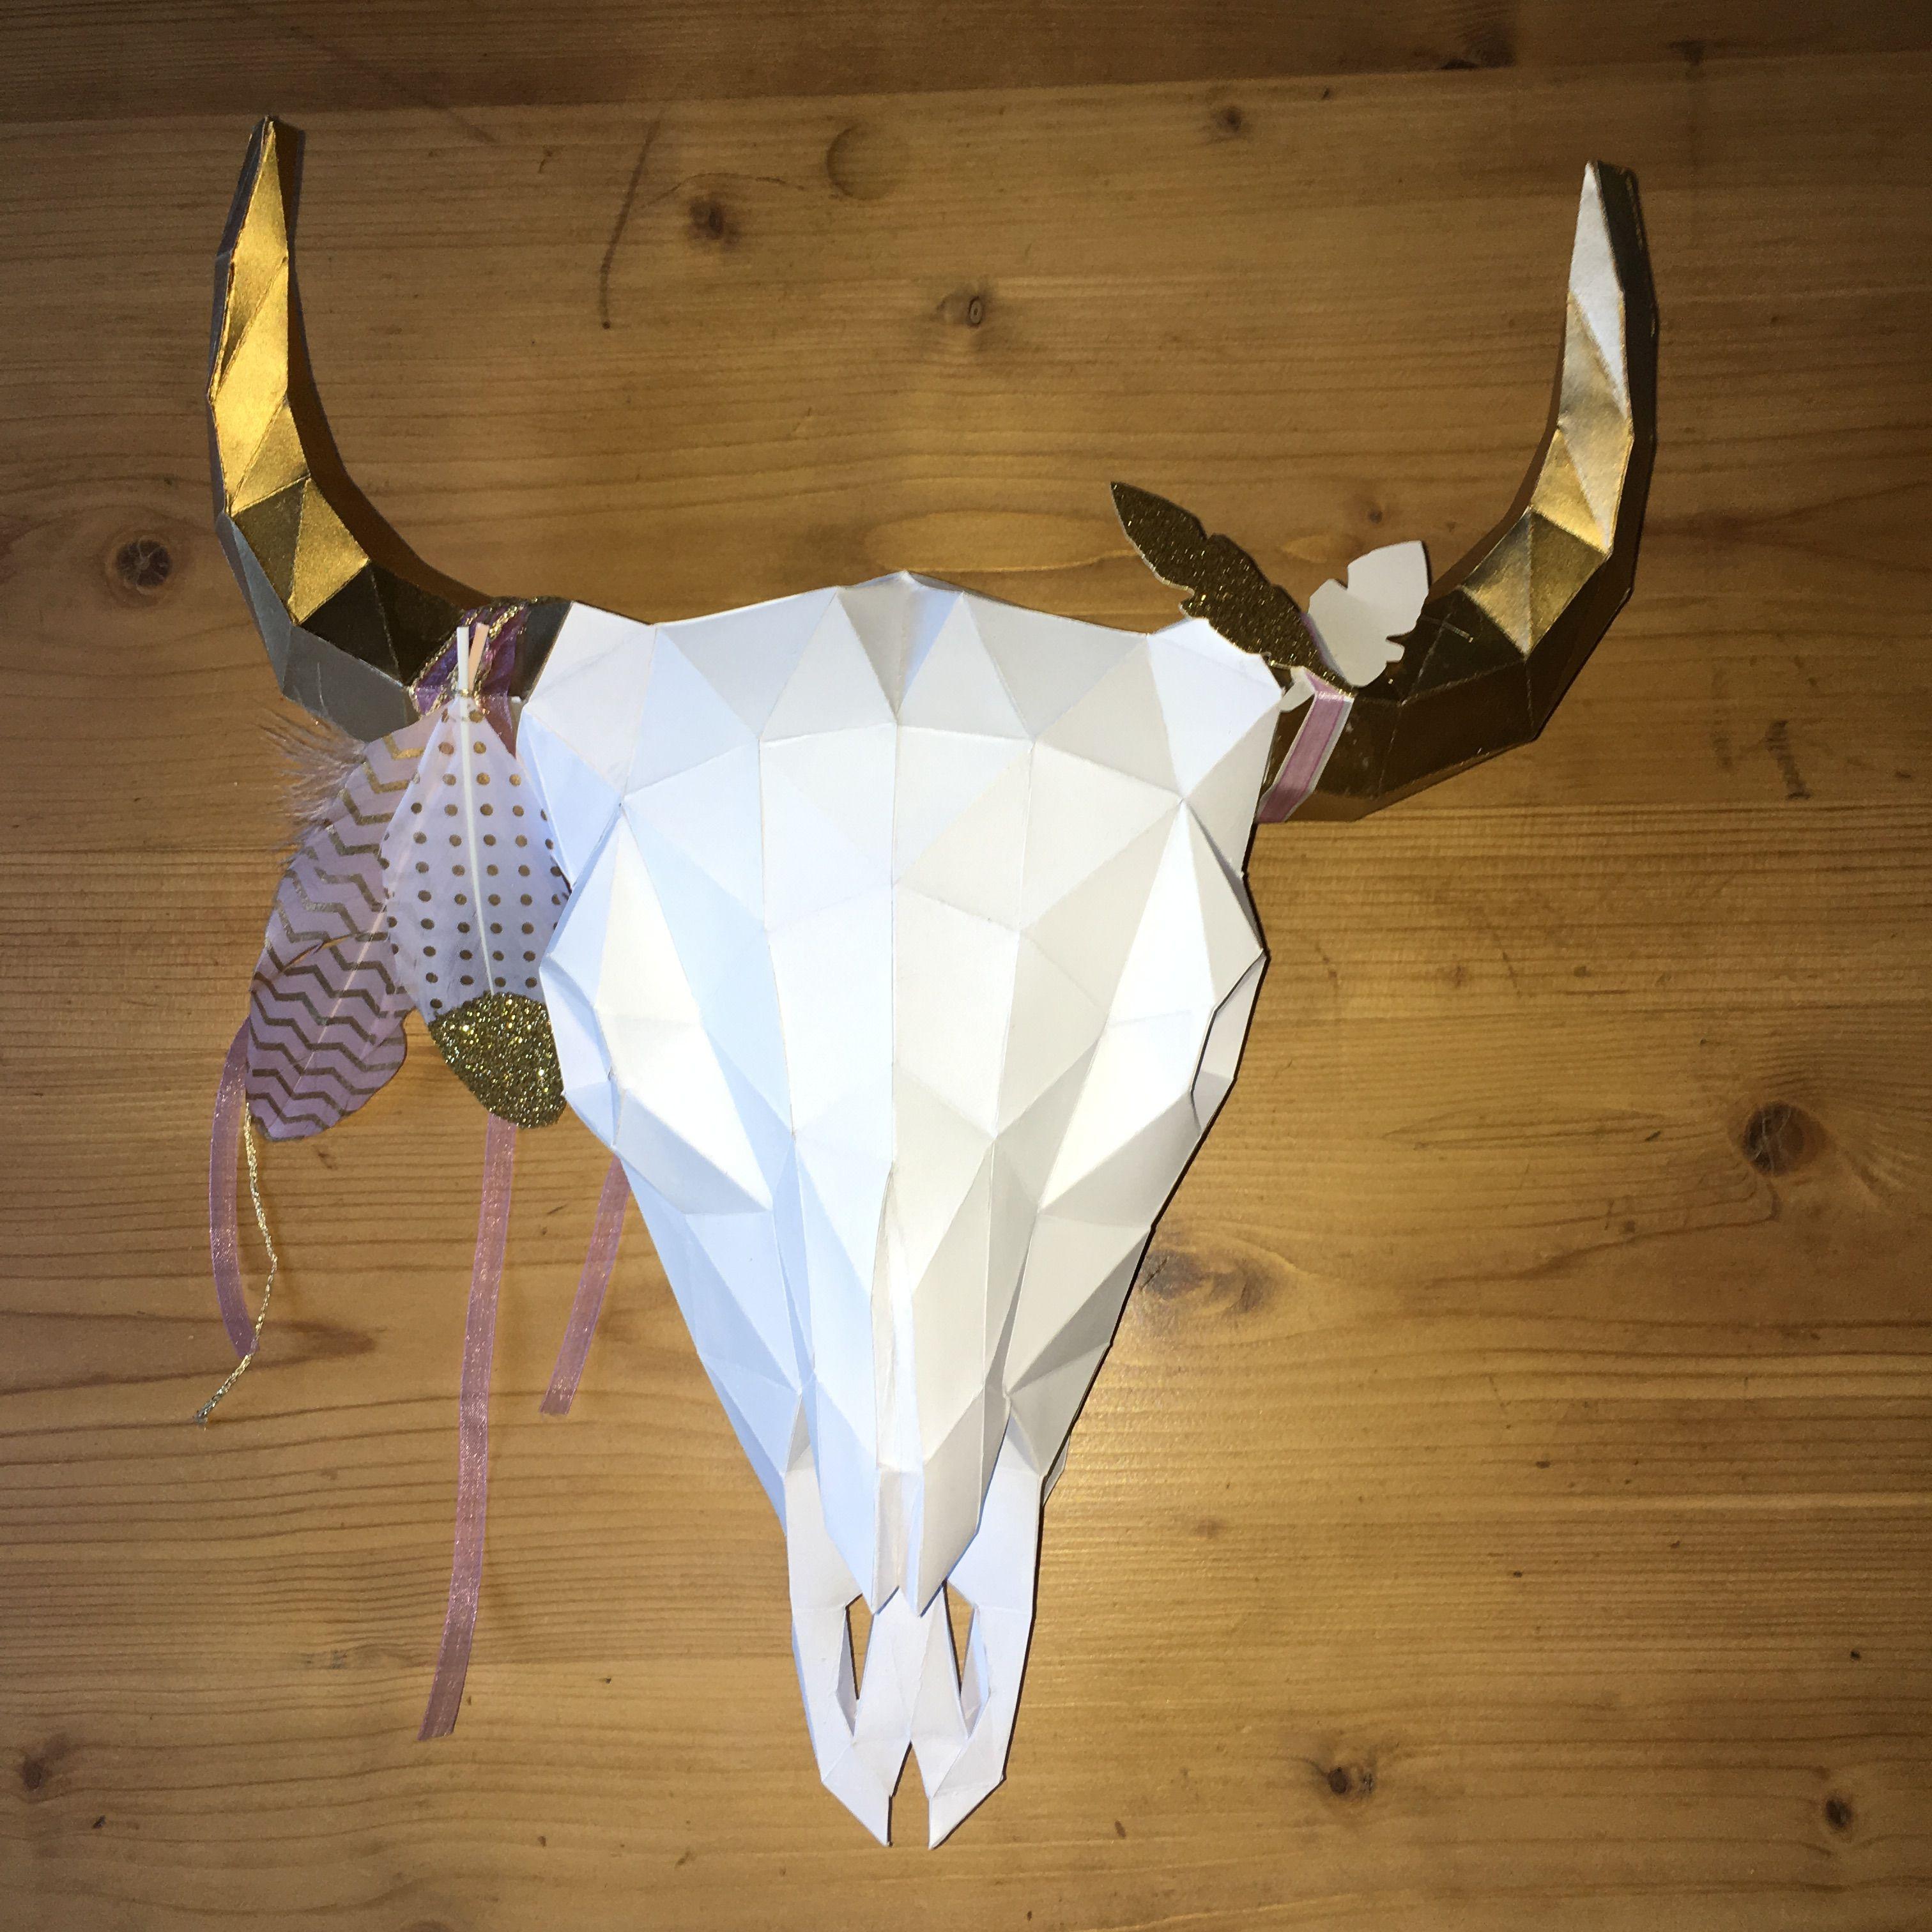 buffalo skull papercraft t te de bison troph e trophy cr ation by myself pinterest. Black Bedroom Furniture Sets. Home Design Ideas